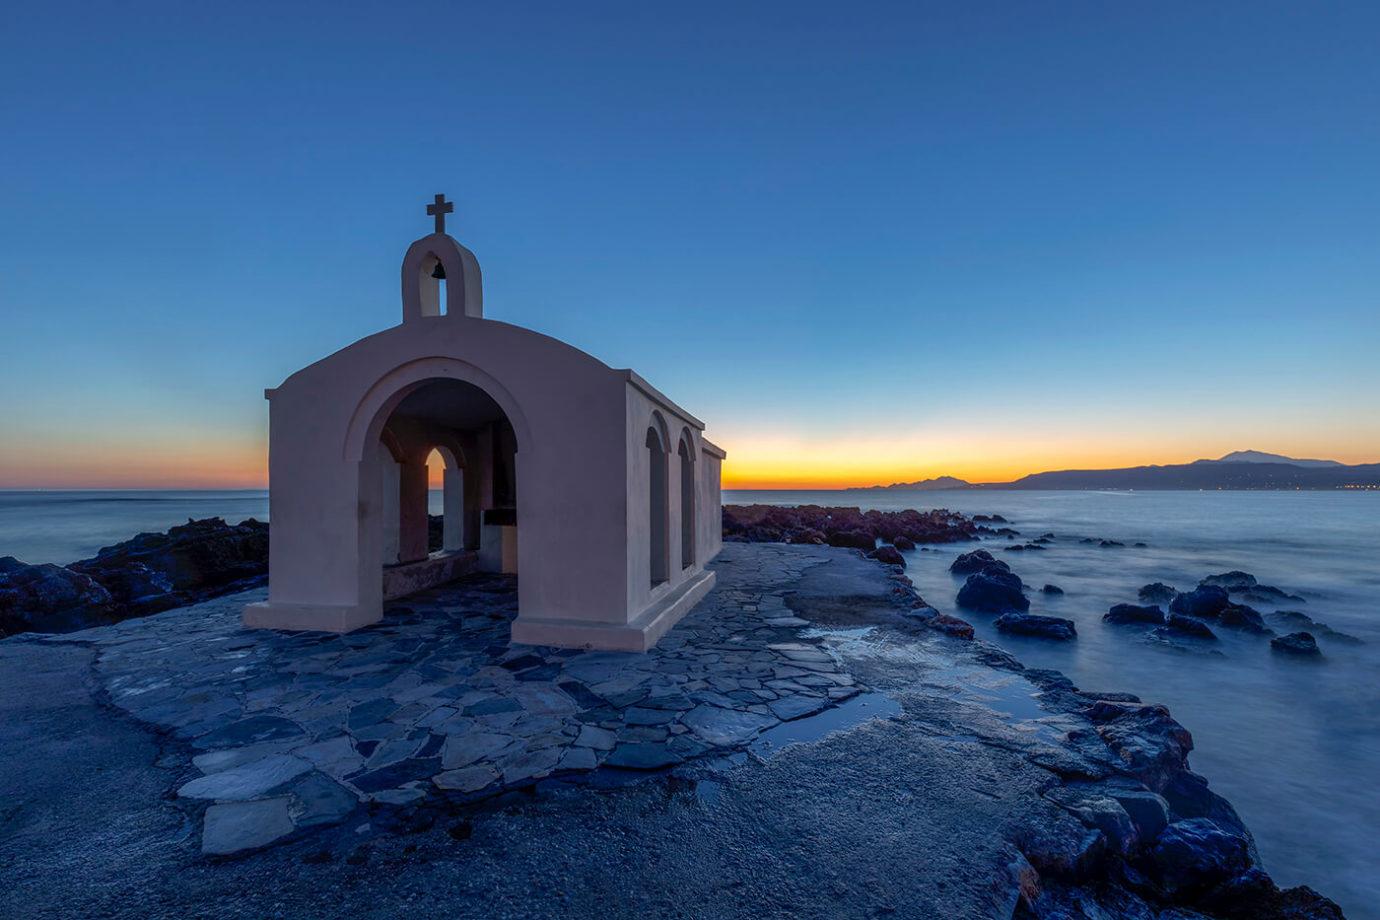 Sunrise, Agios Nikolaos Chapel, Georgioupolis, photos of Crete, Greece